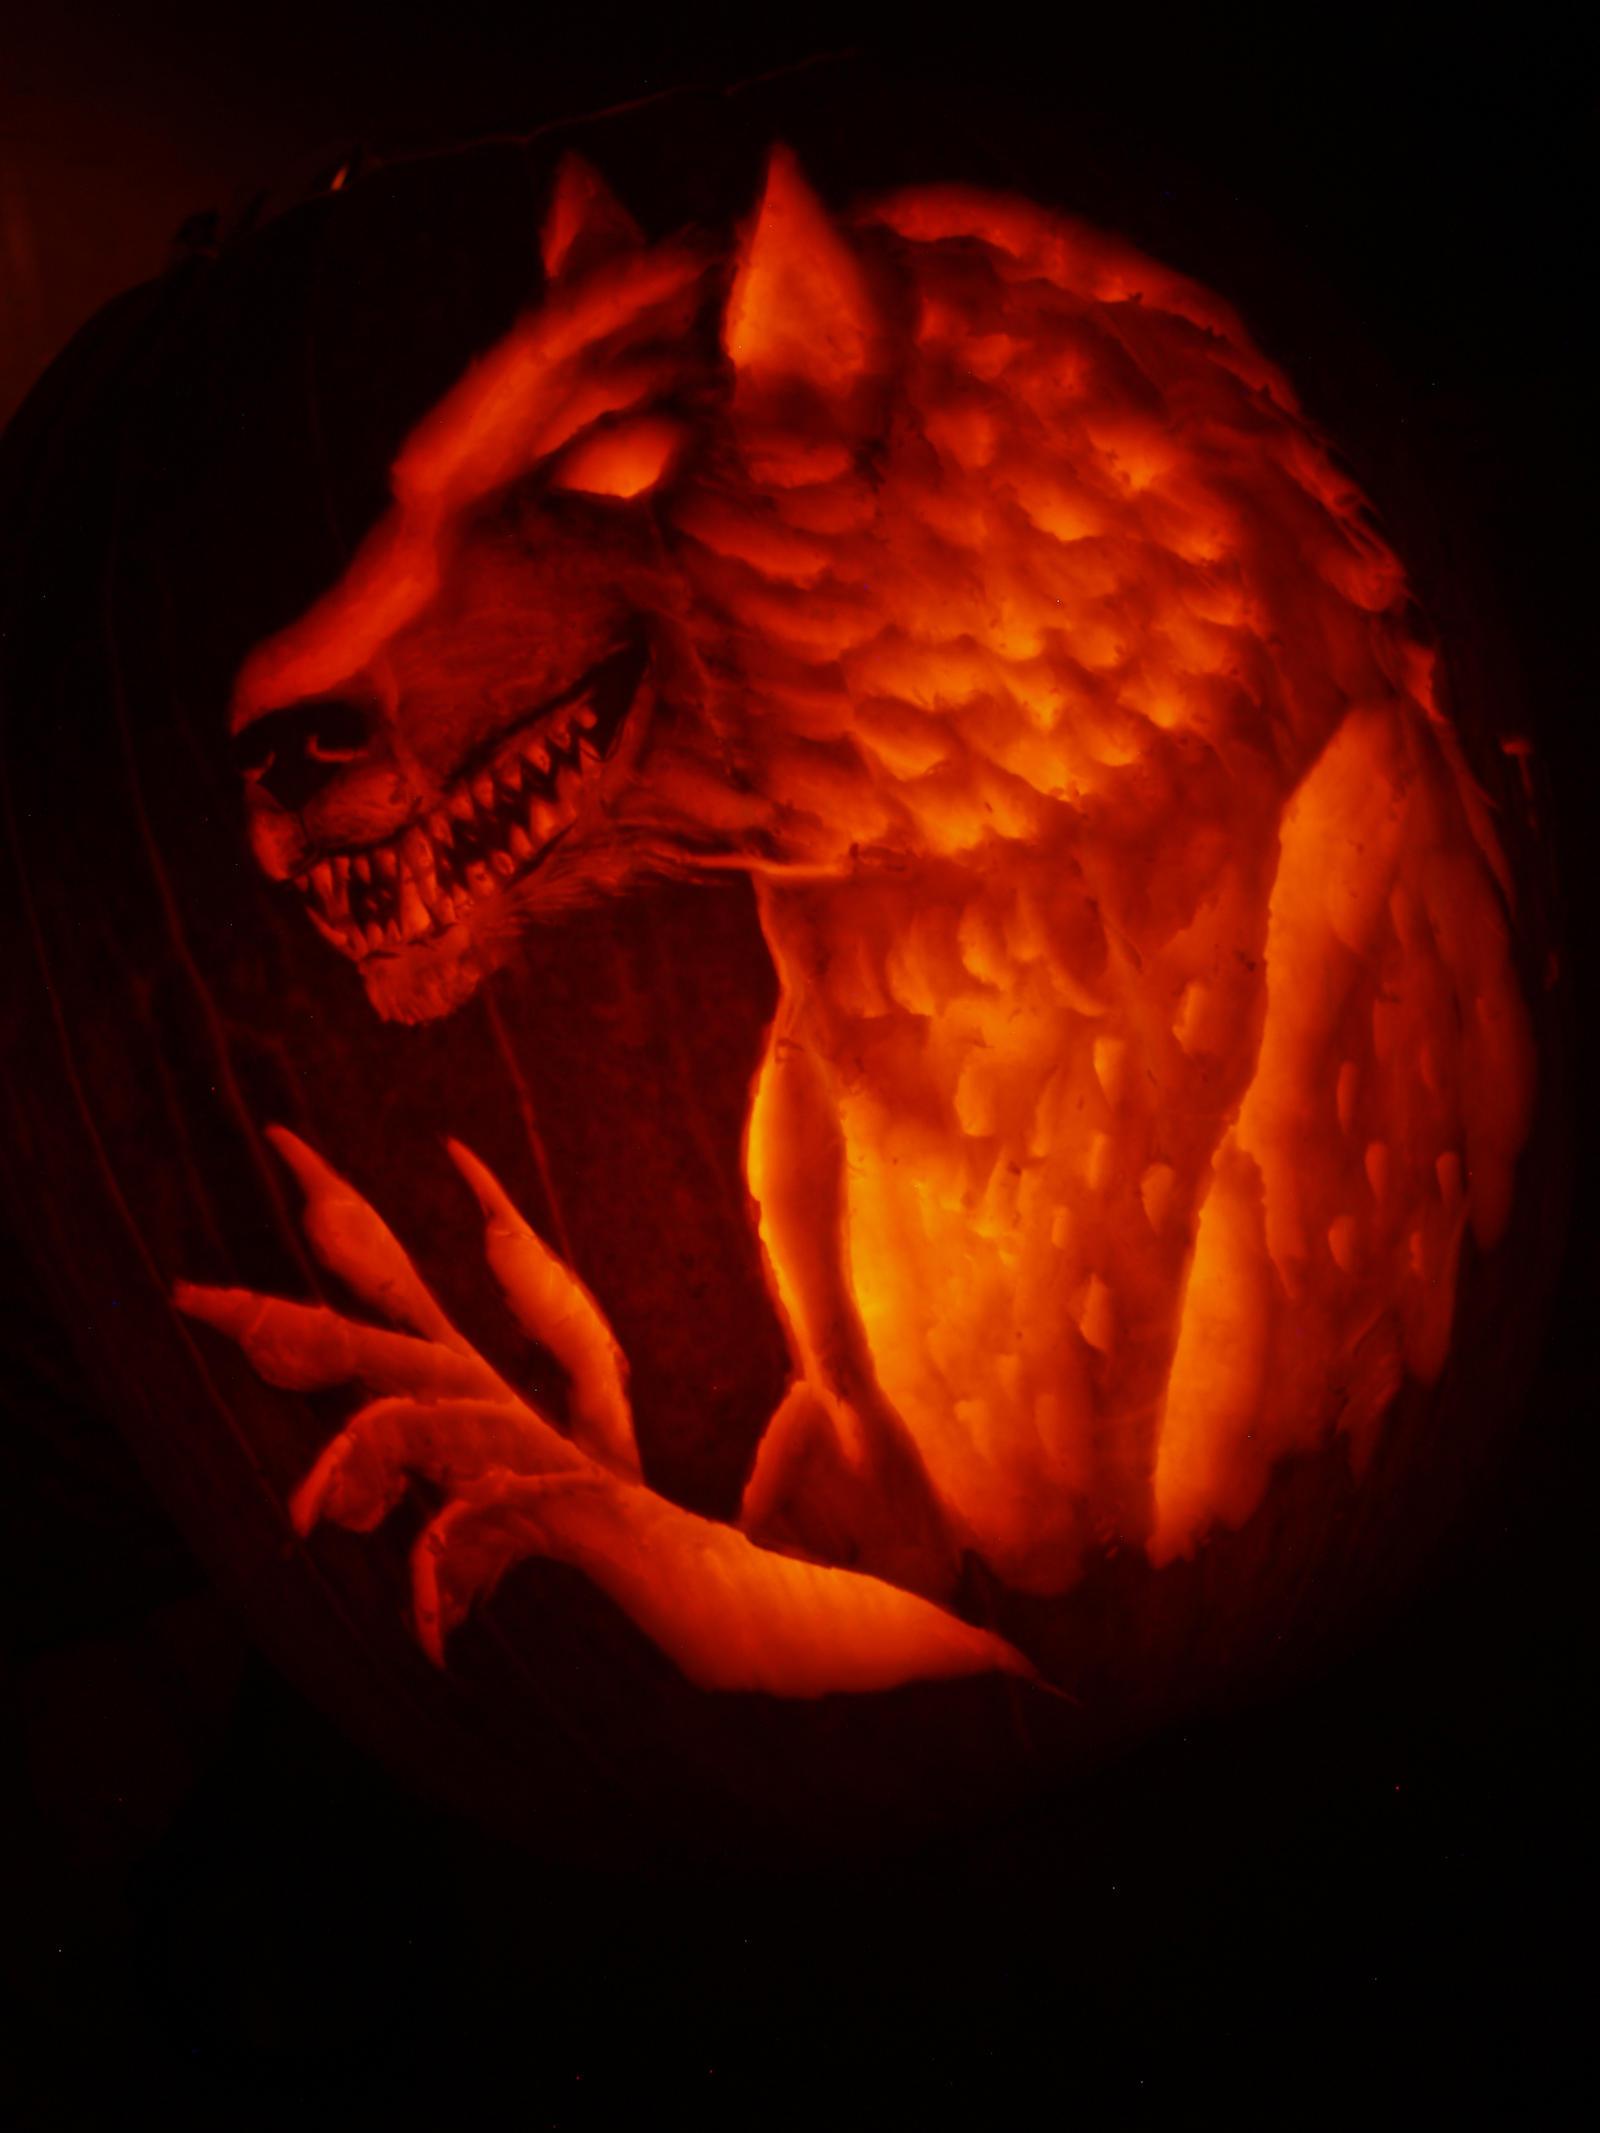 Werewolf by Marinatedhippo